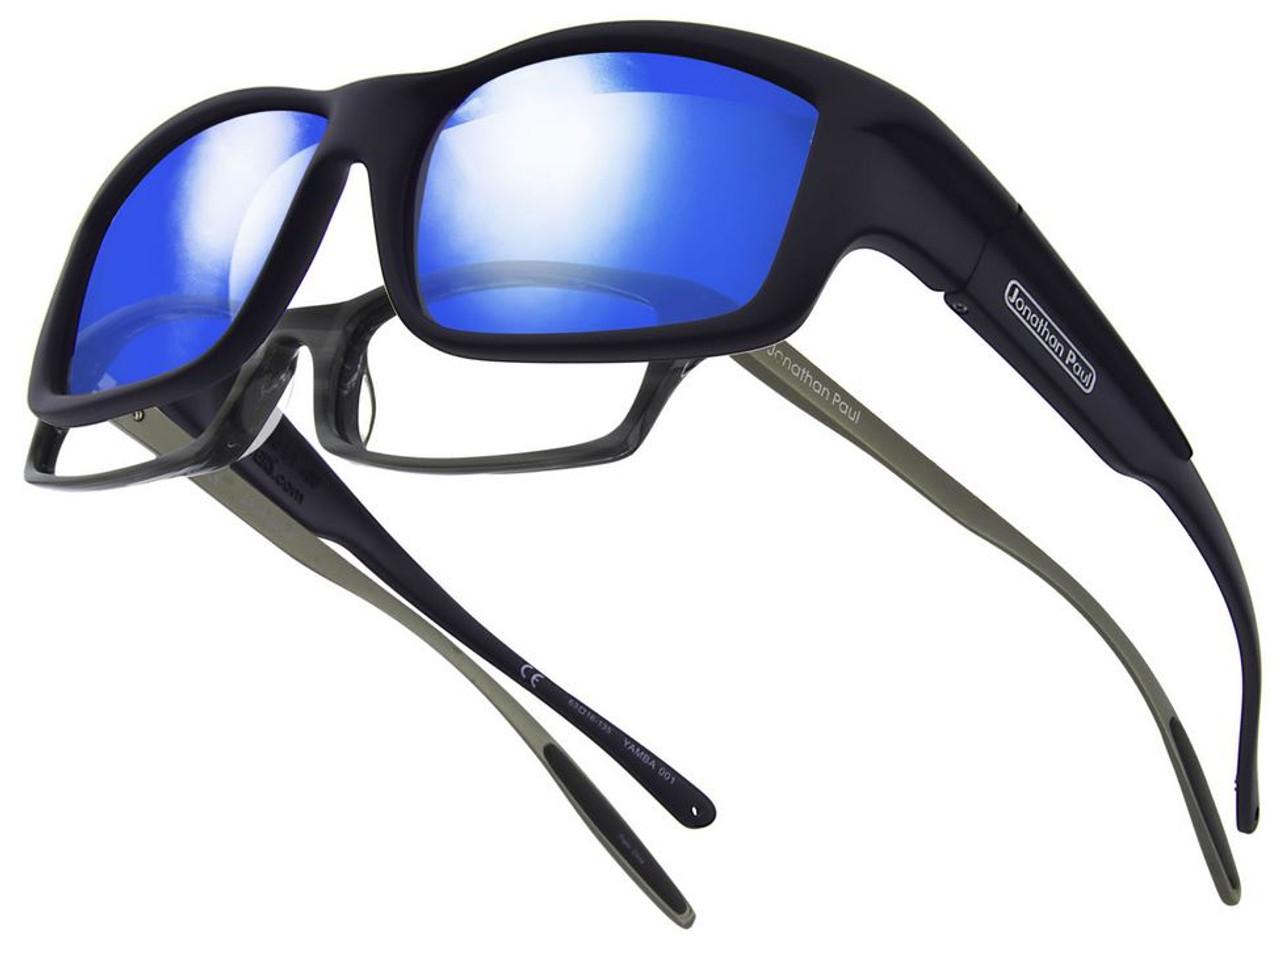 7eaf337ec2 Jonathan Paul® Fitovers Eyewear X-Large Yamba in Satin-Black   Blue Mirror